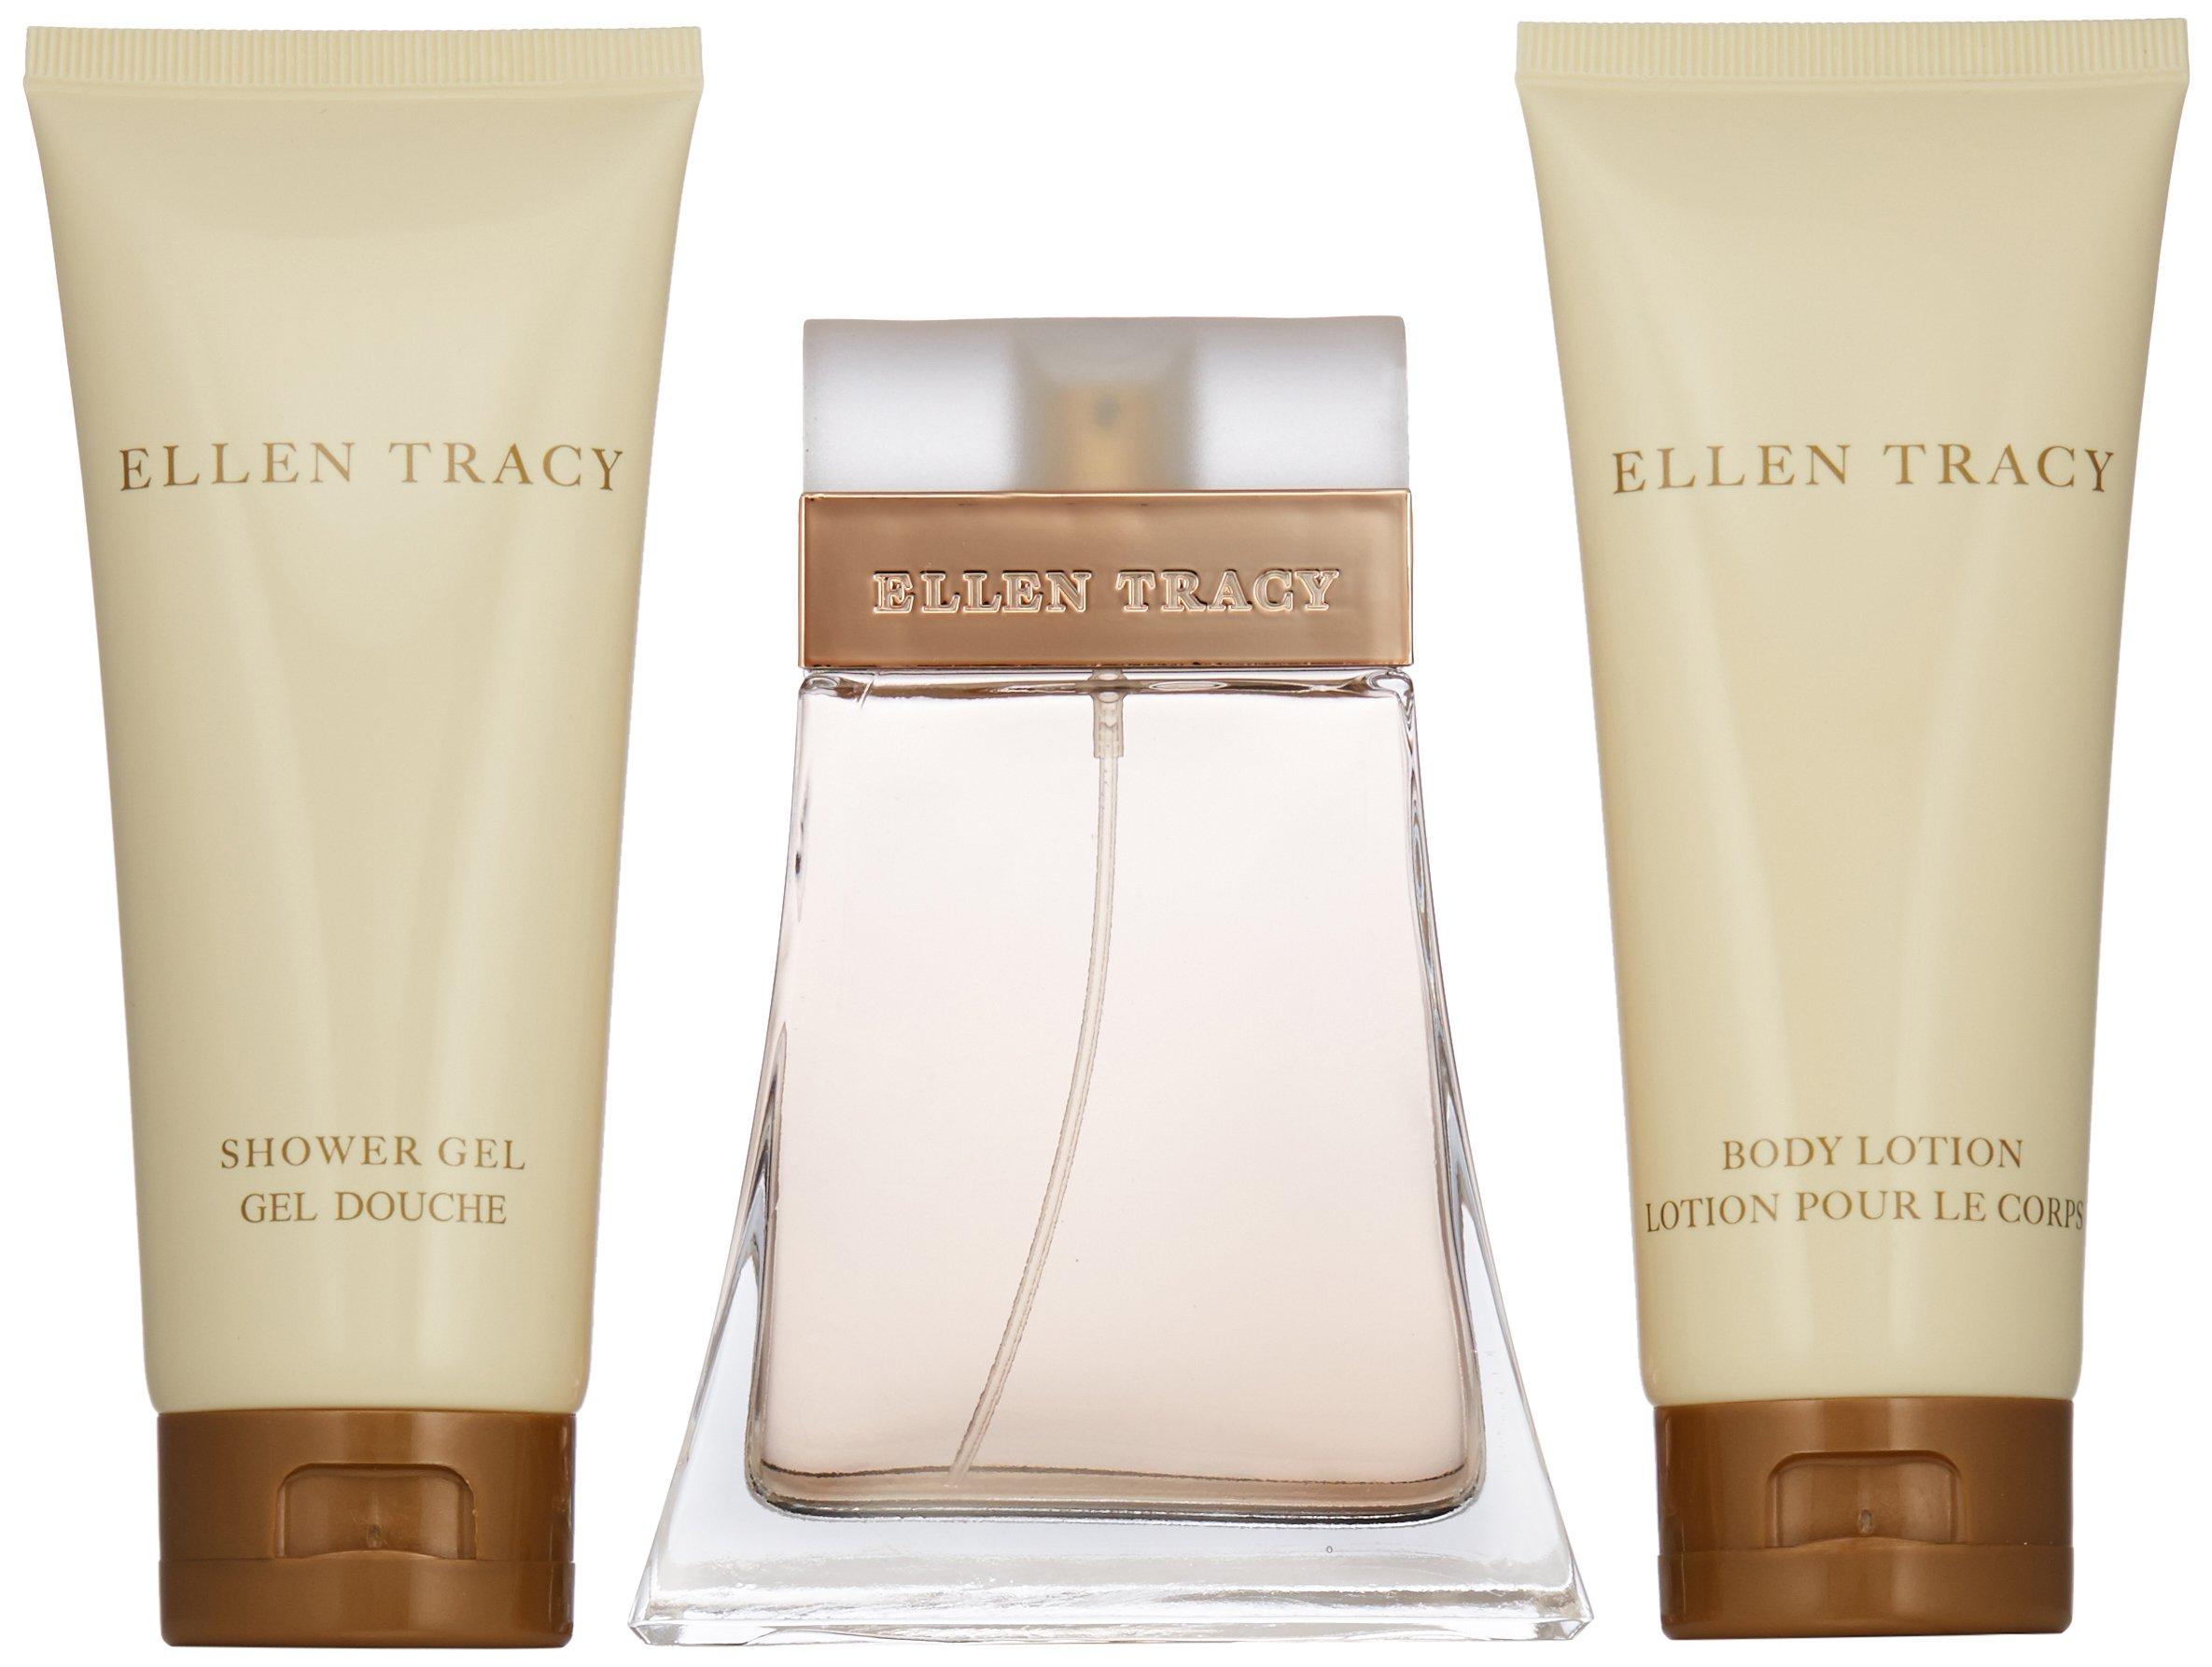 Ellen Tracy Gift Set Perfume for Women, 3 Count by Ellen Tracy (Image #4)